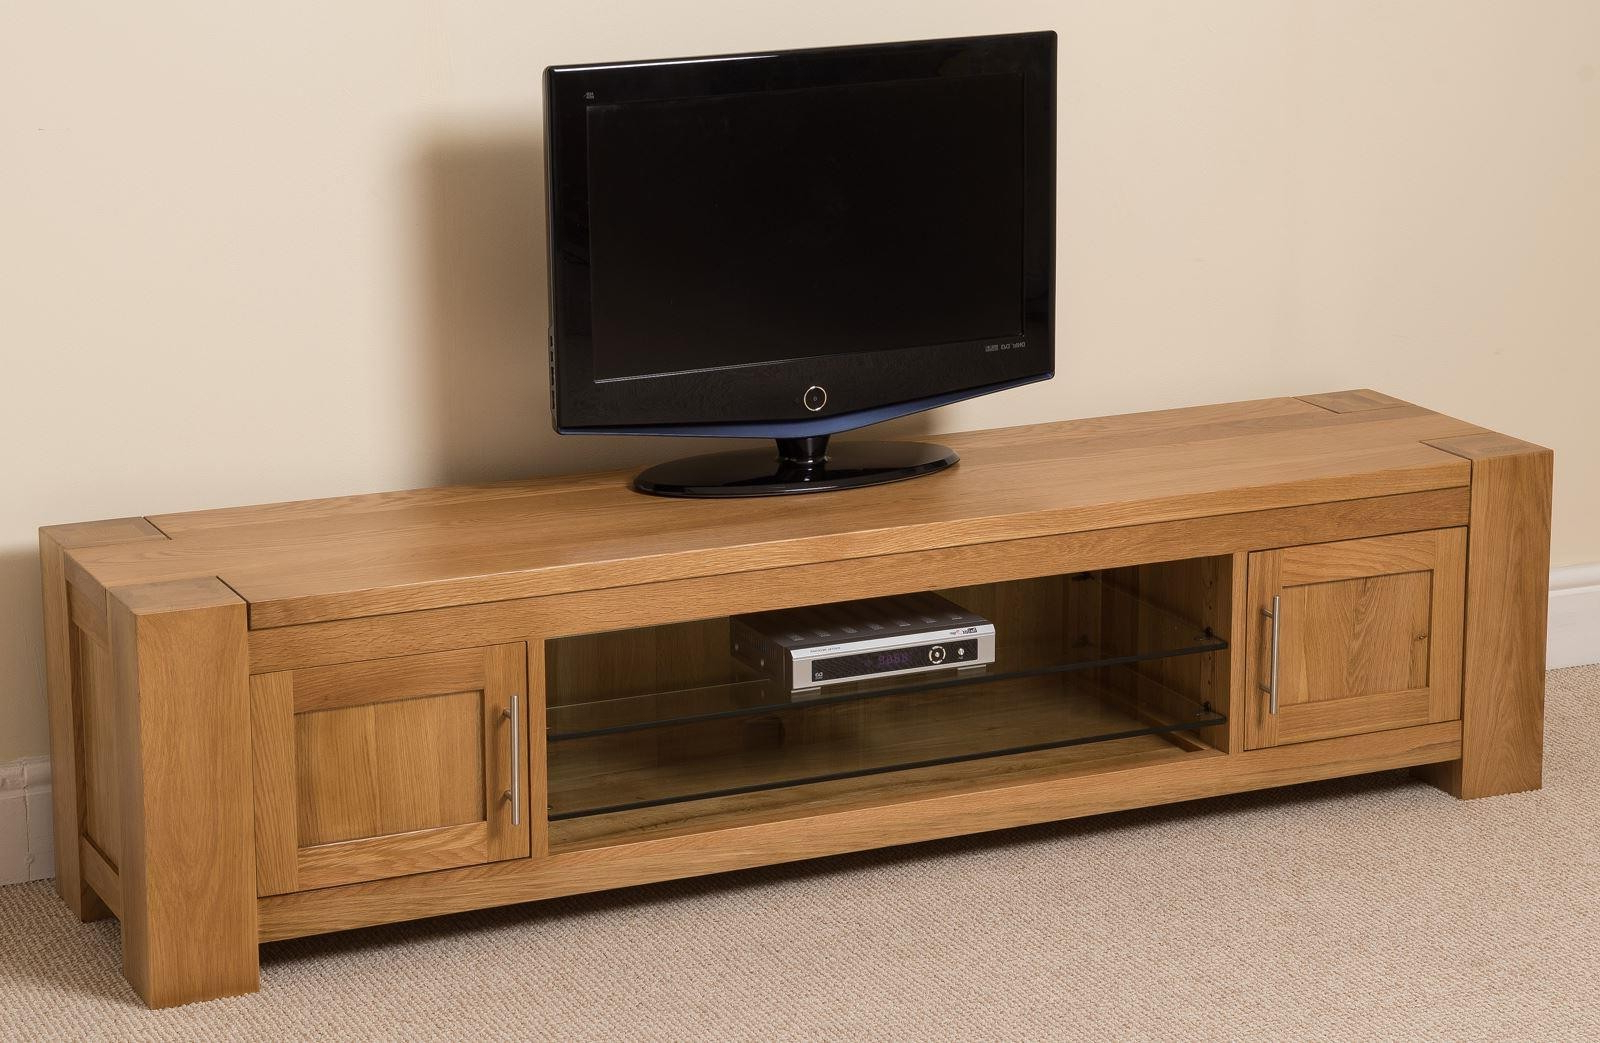 Oak Furniture King (View 2 of 20)